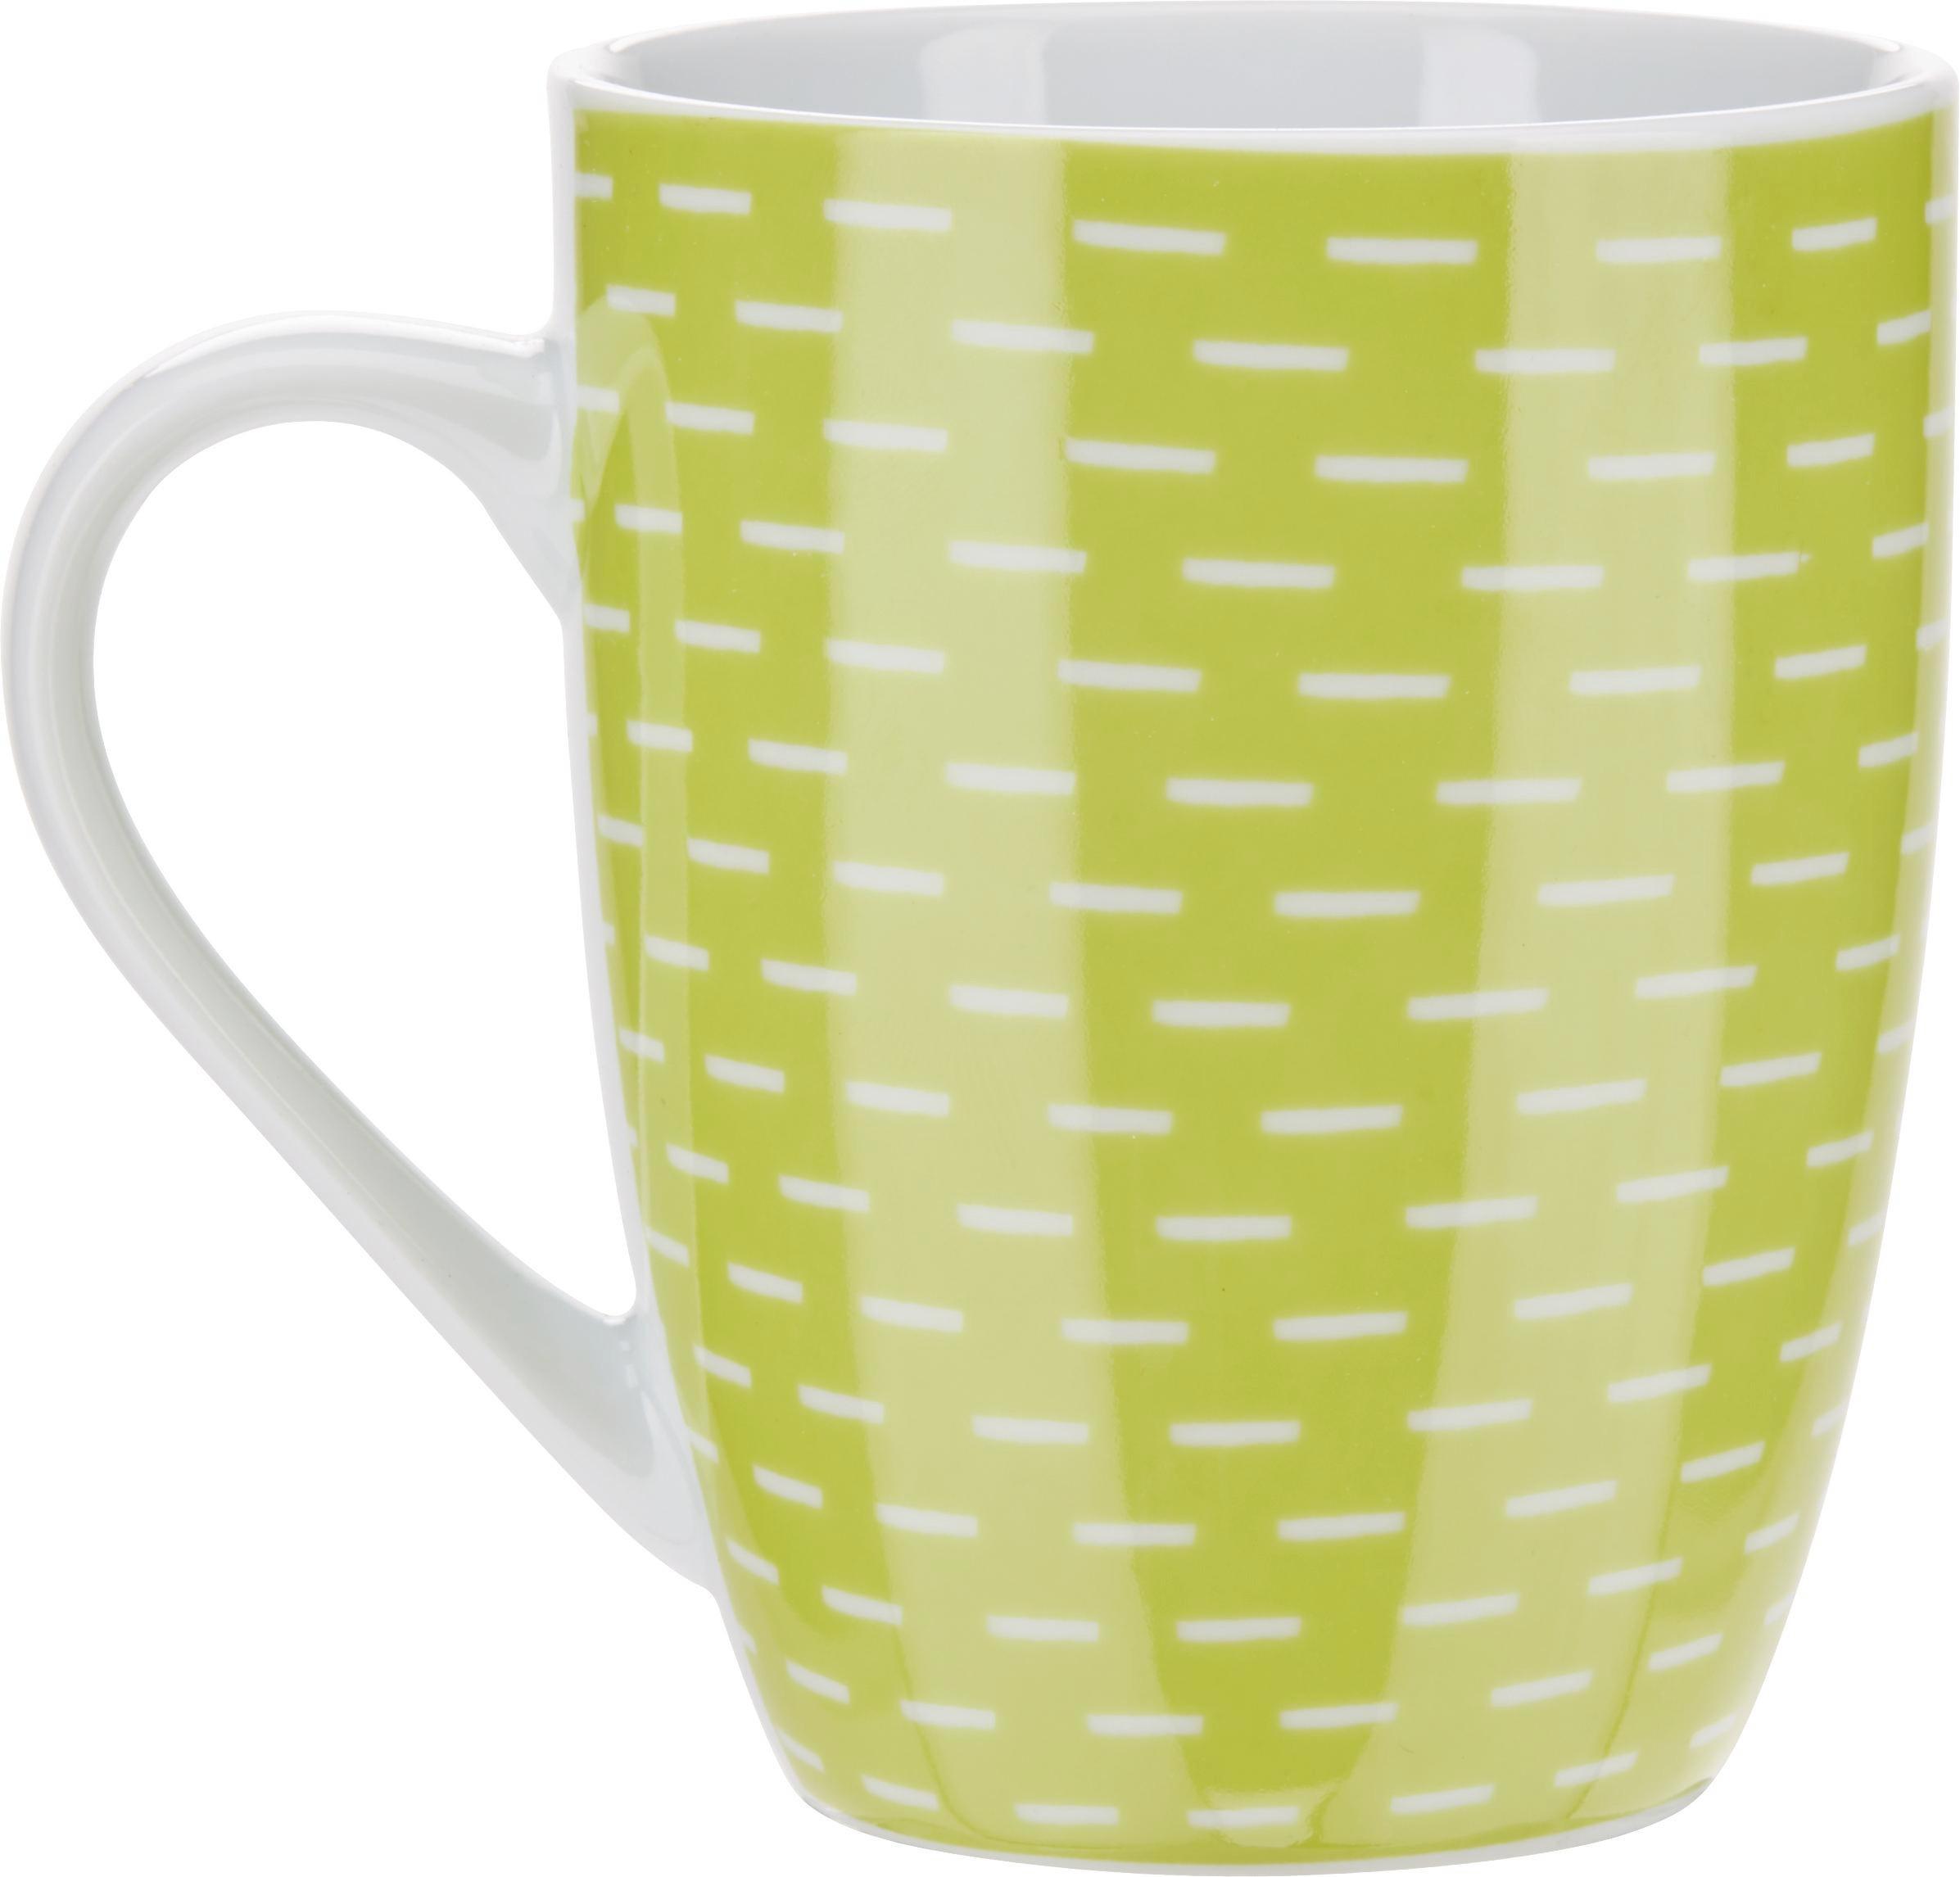 Kaffeebecher Shelly in Grün/Weiß - Weiß/Grün, Keramik (8,6/10,5cm) - MÖMAX modern living